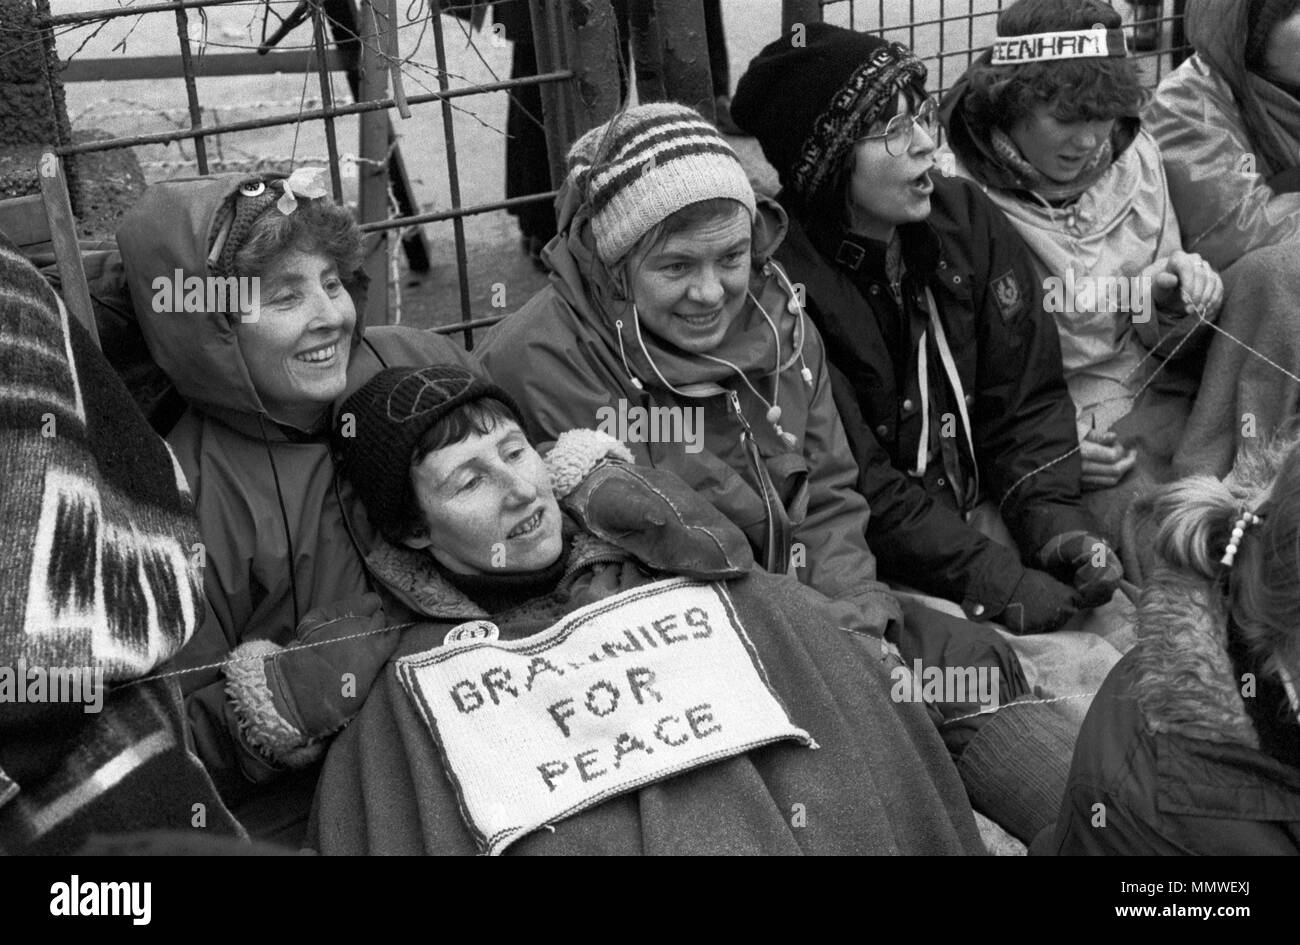 Greenham Common Frauen Friedenscamp. Omas für Frieden, ältere Frauen sitzen Protest 1985, 1980 s UK HOMER SYKES Stockbild